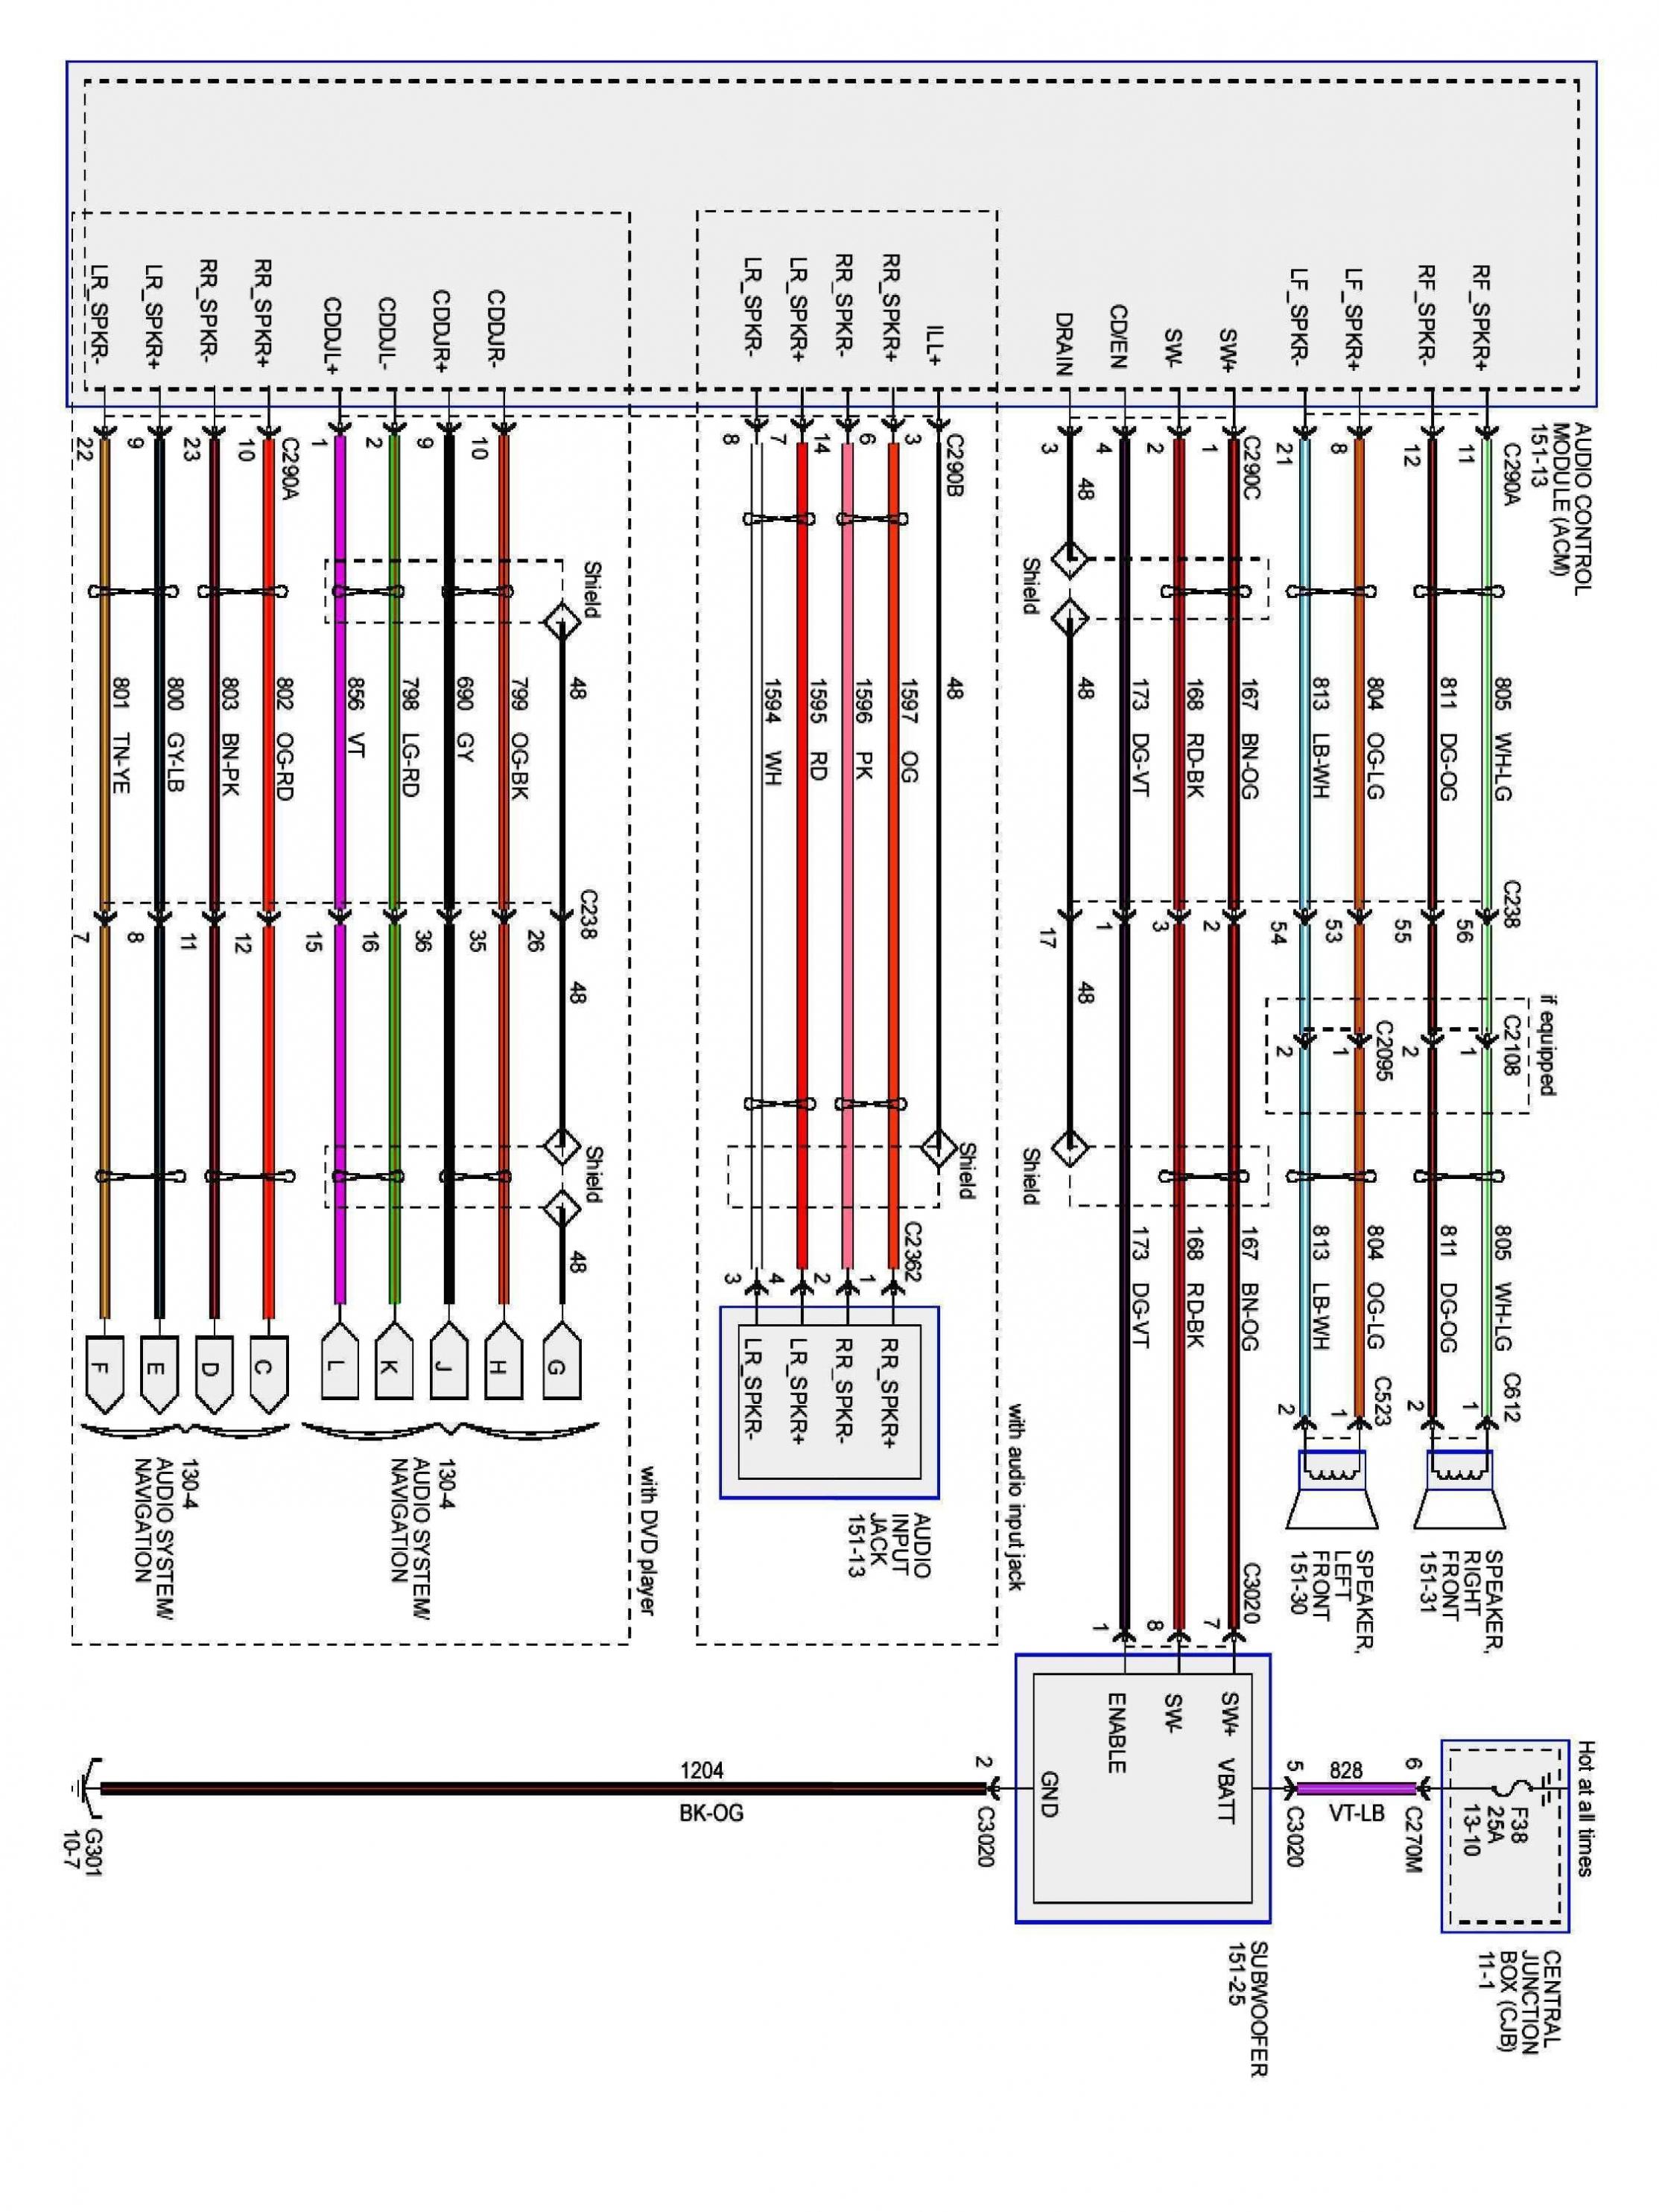 2008 F350 Trailer Wiring Harness Diagram - Data Wiring Diagram Site - Ford F250 Trailer Wiring Harness Diagram